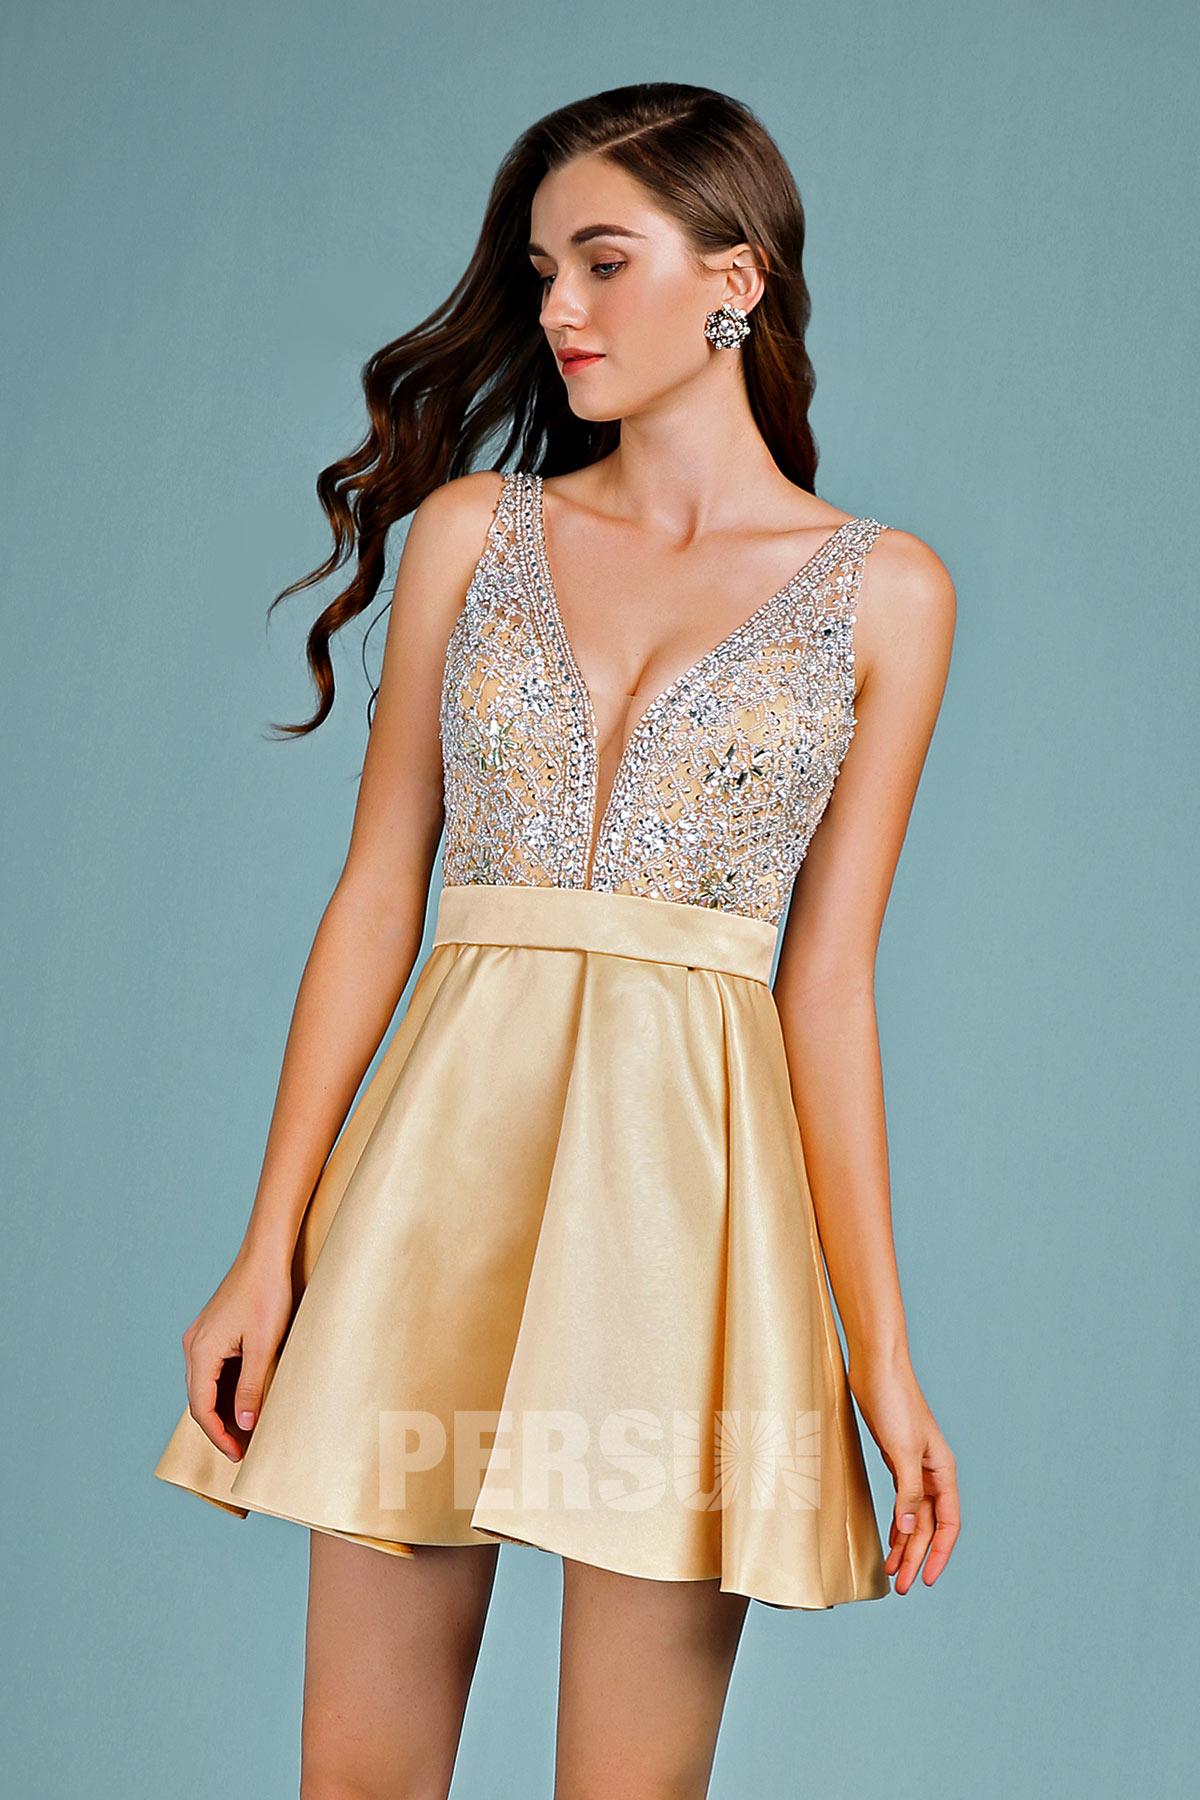 Robe patineuse sexy dorée courte garni de bijoux scintillant